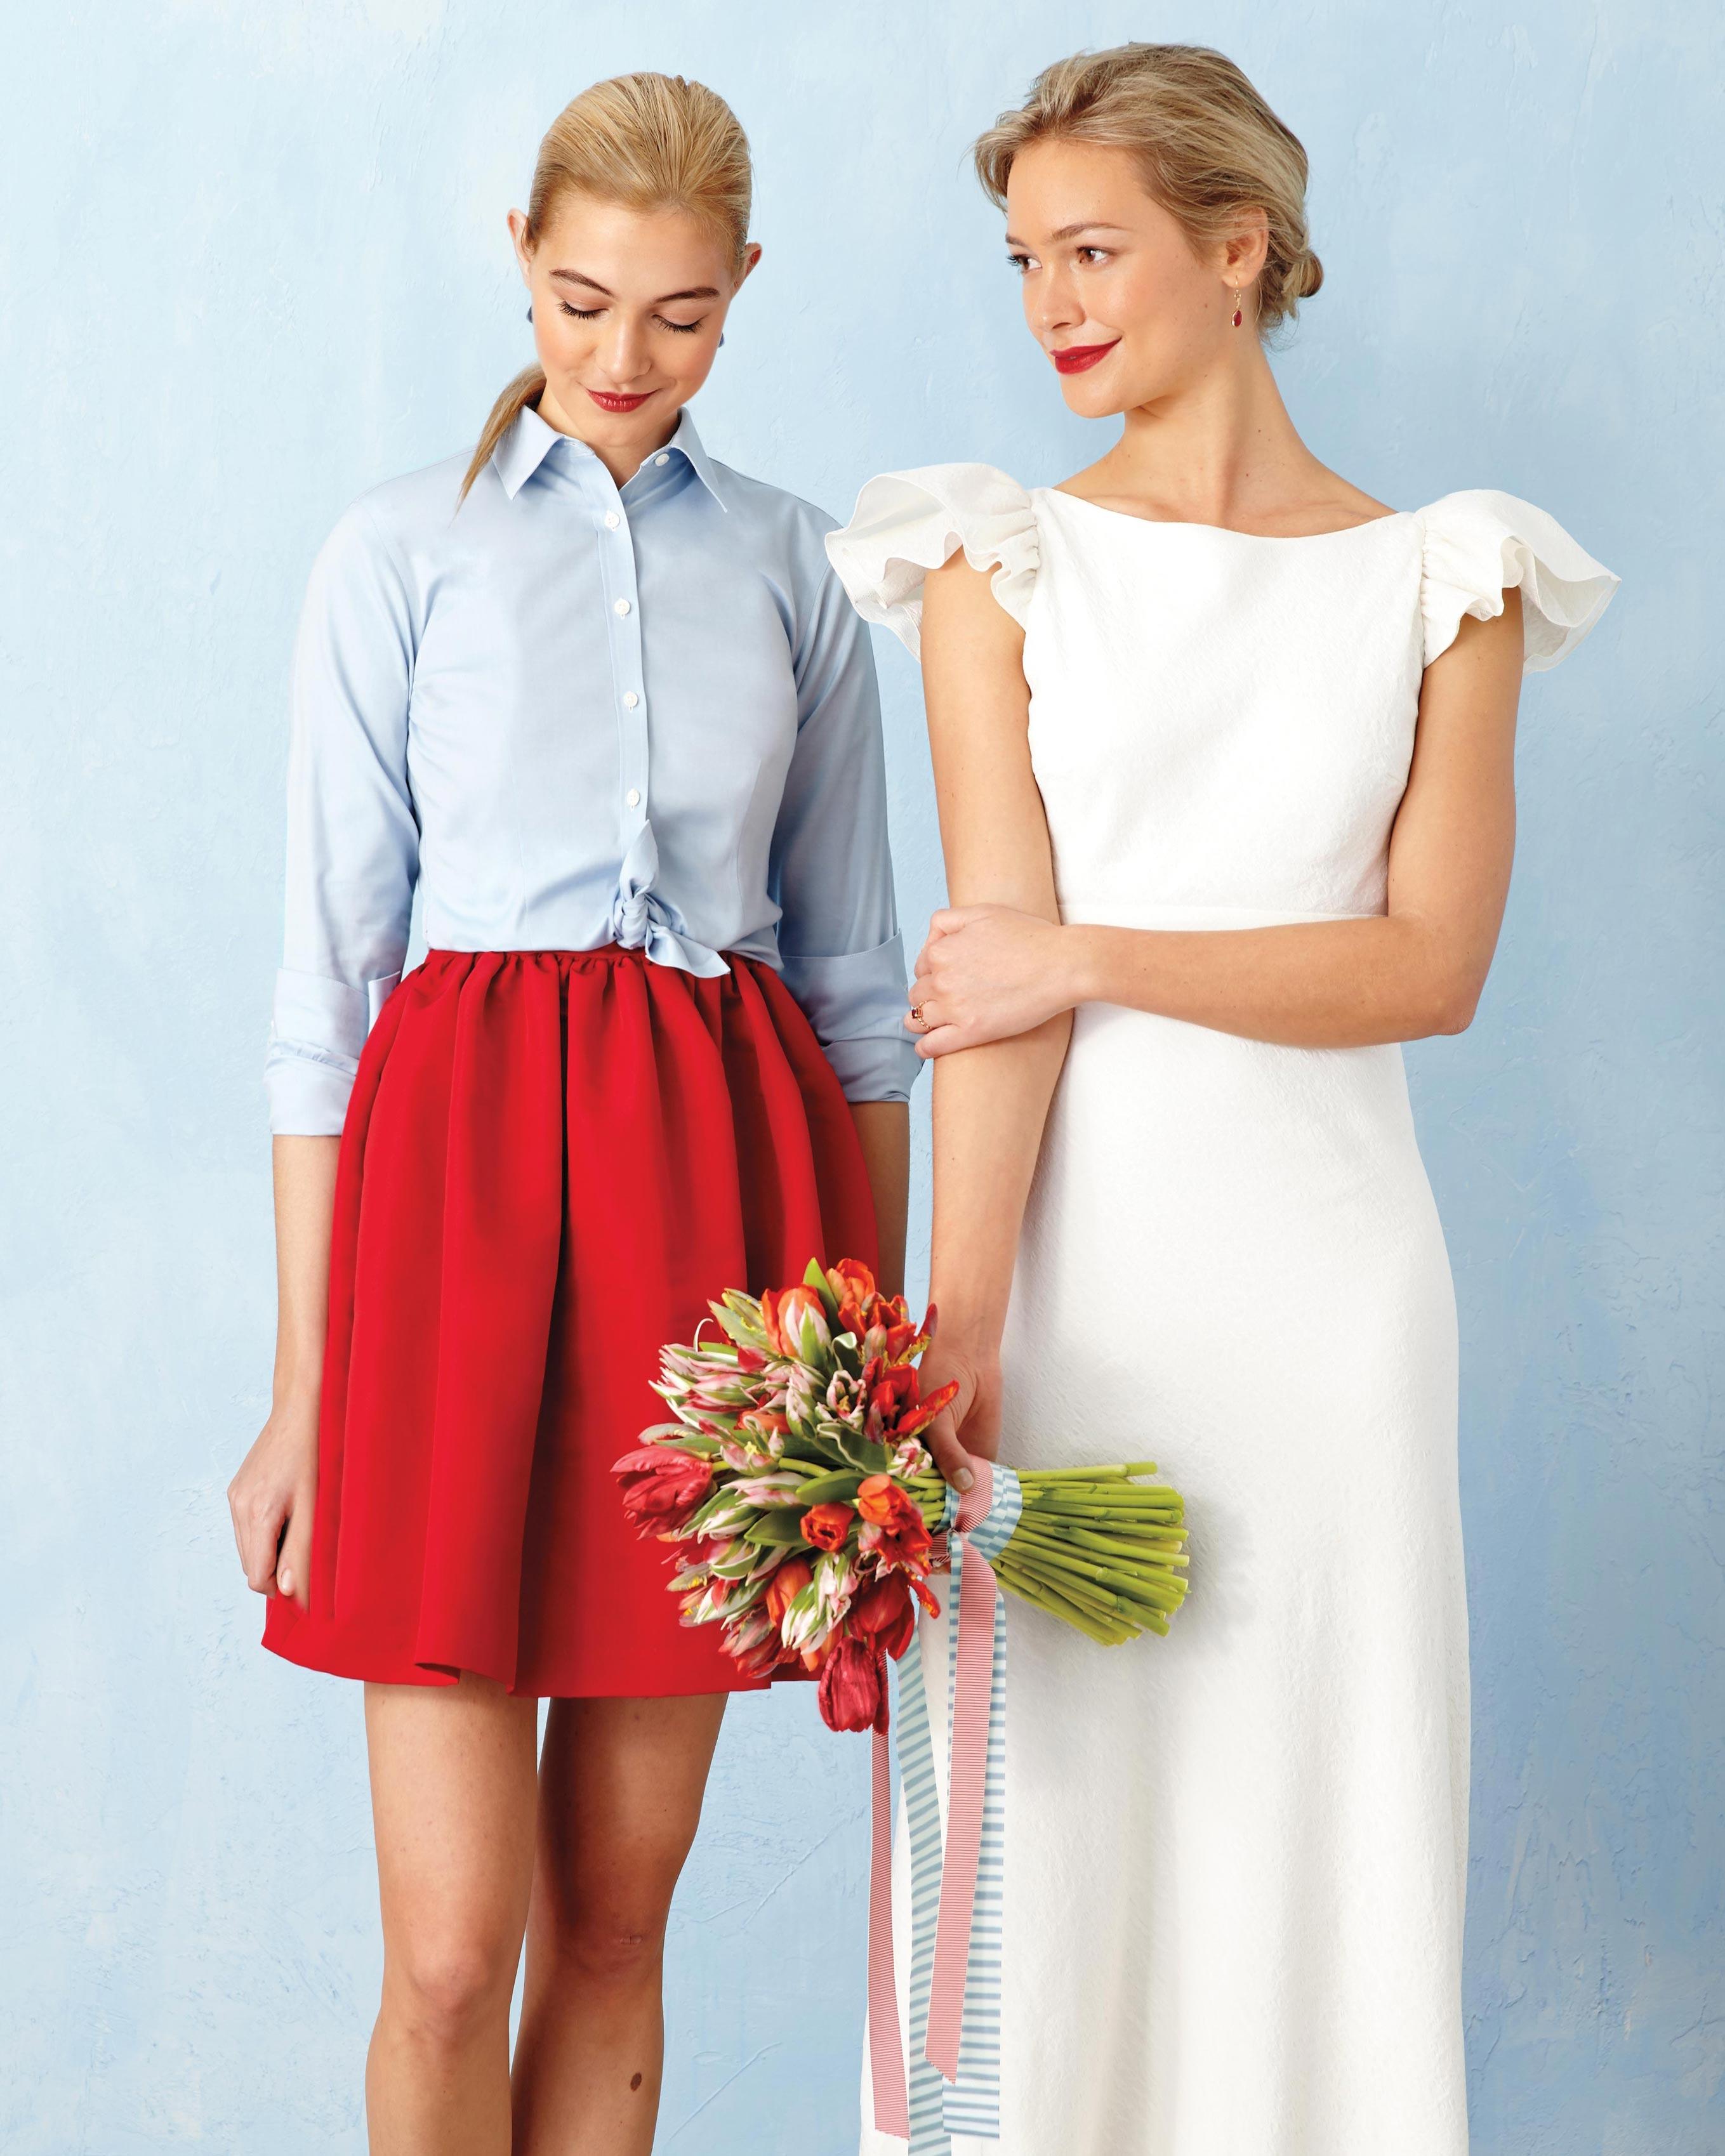 blue-red-wedding-colors-fashion-bride-bridesmaid-398-d112667-comp.jpg